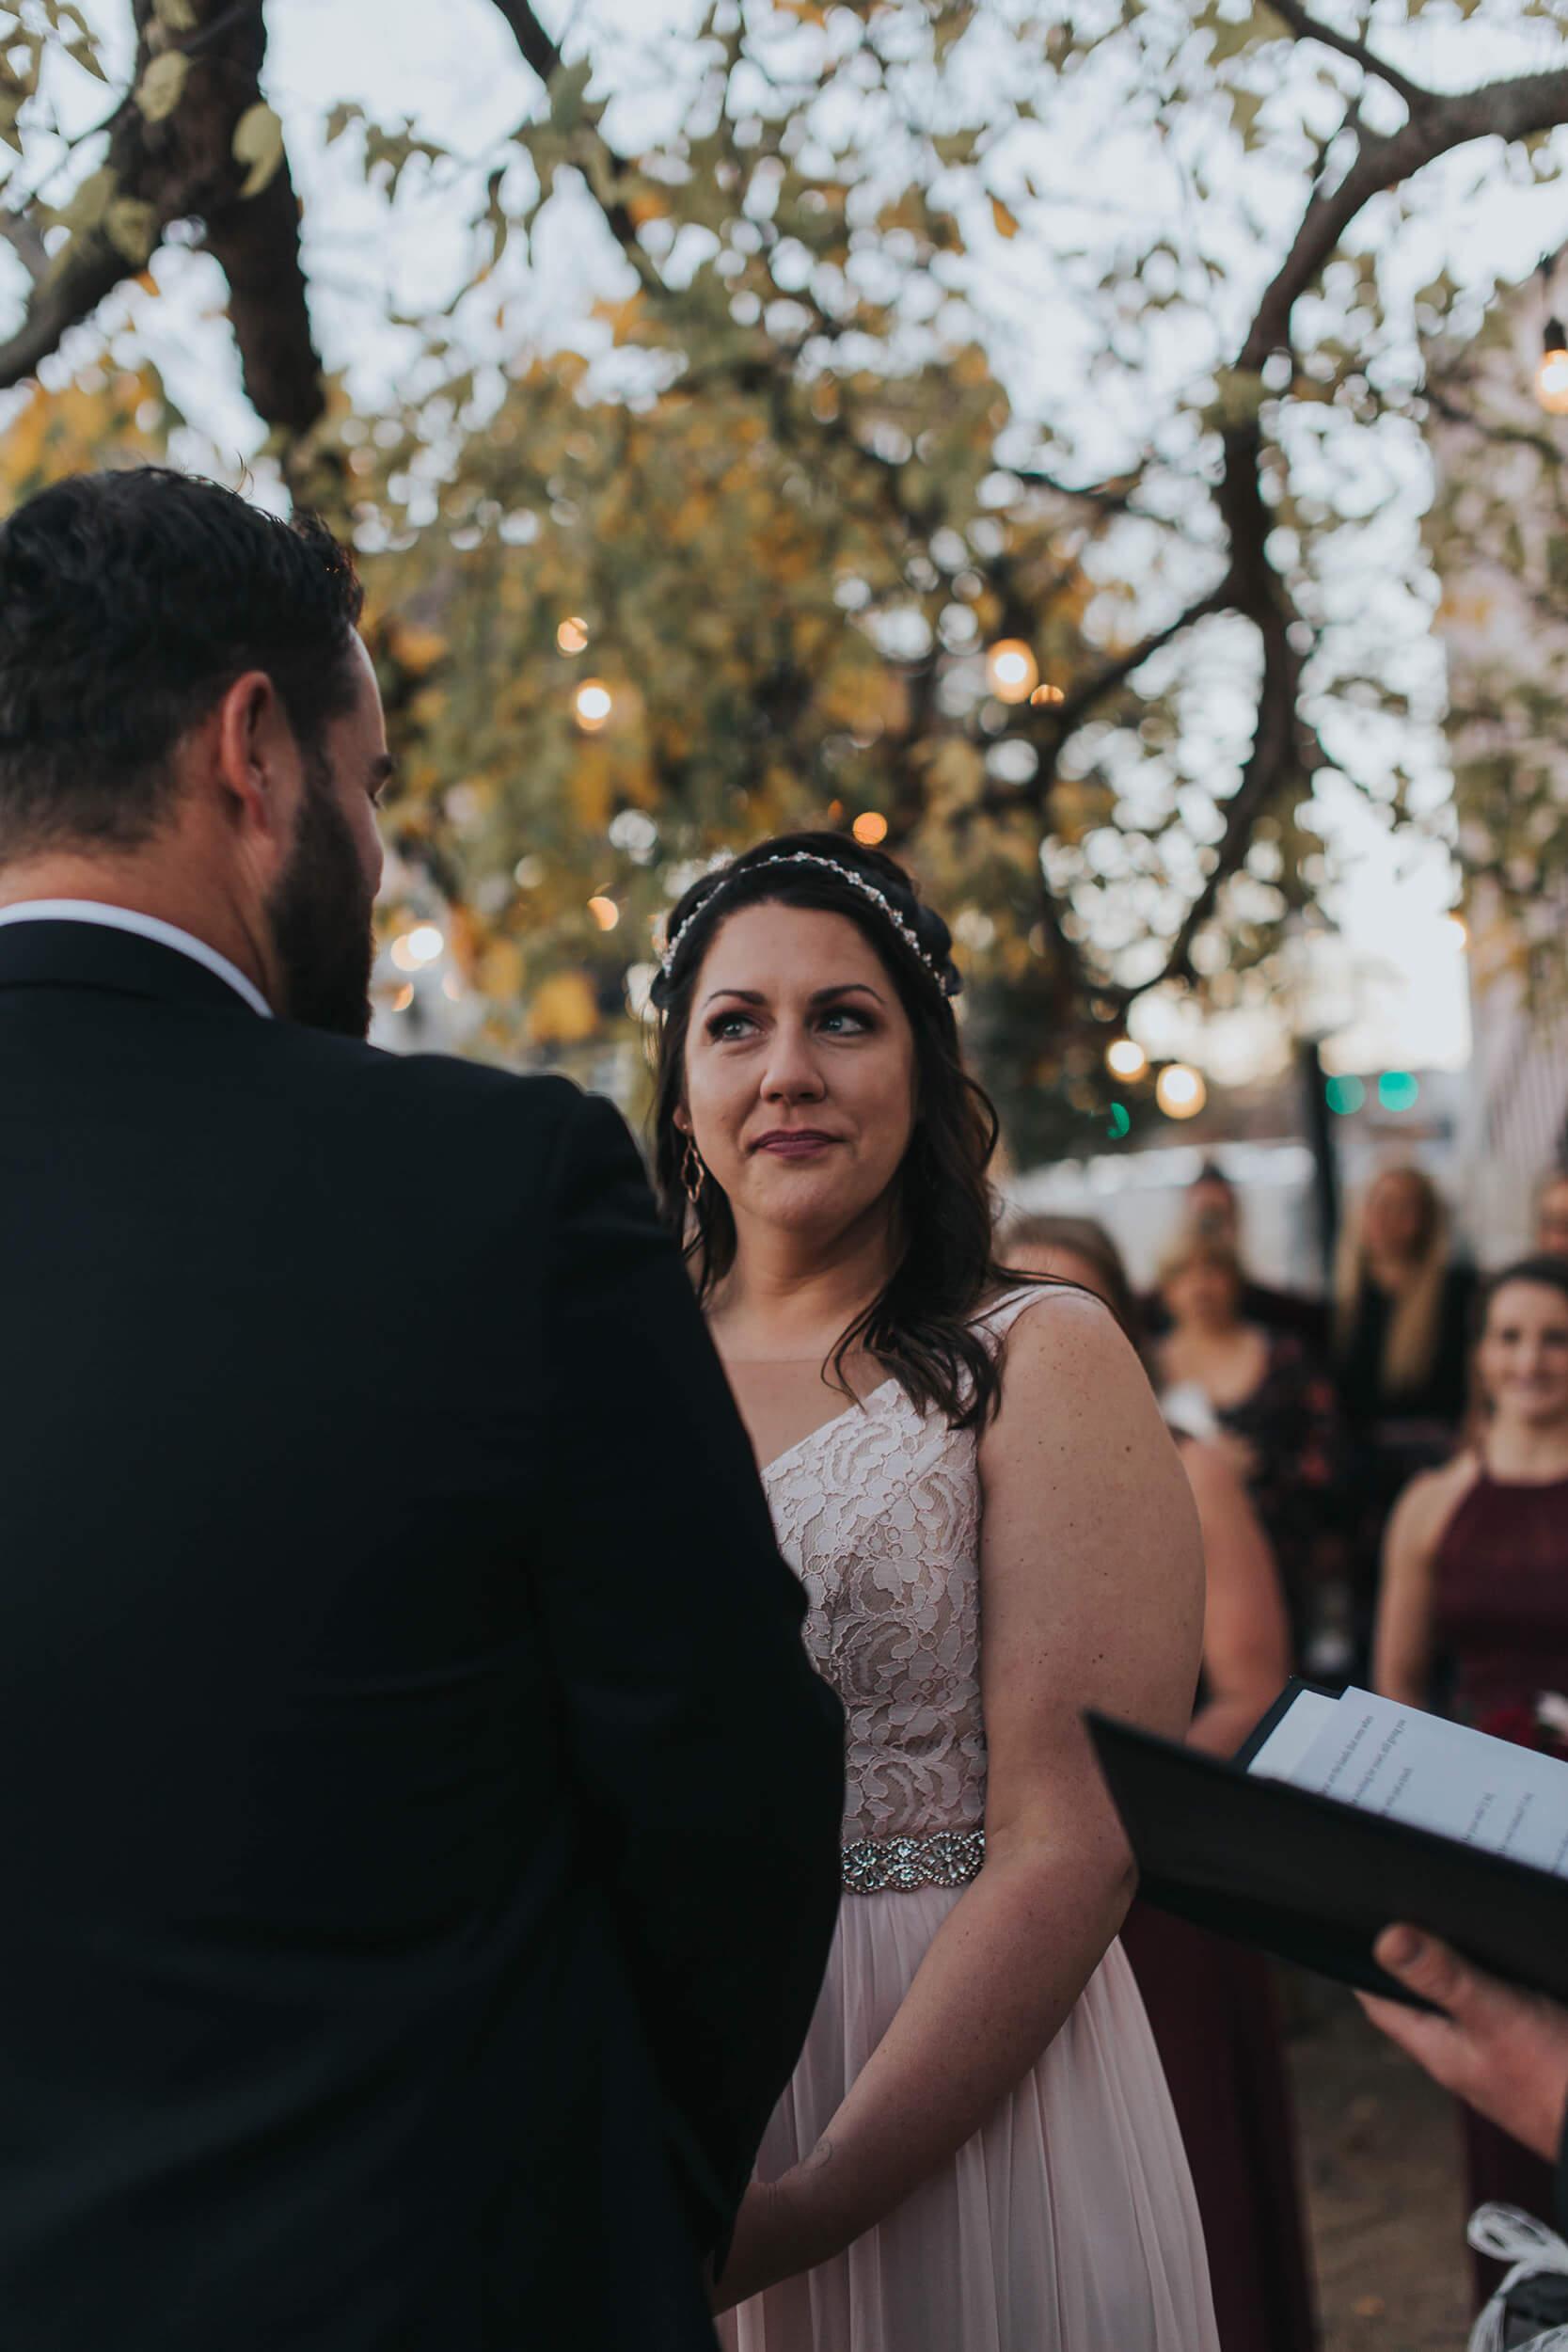 newborn photography okc - okc photography - wedding photography